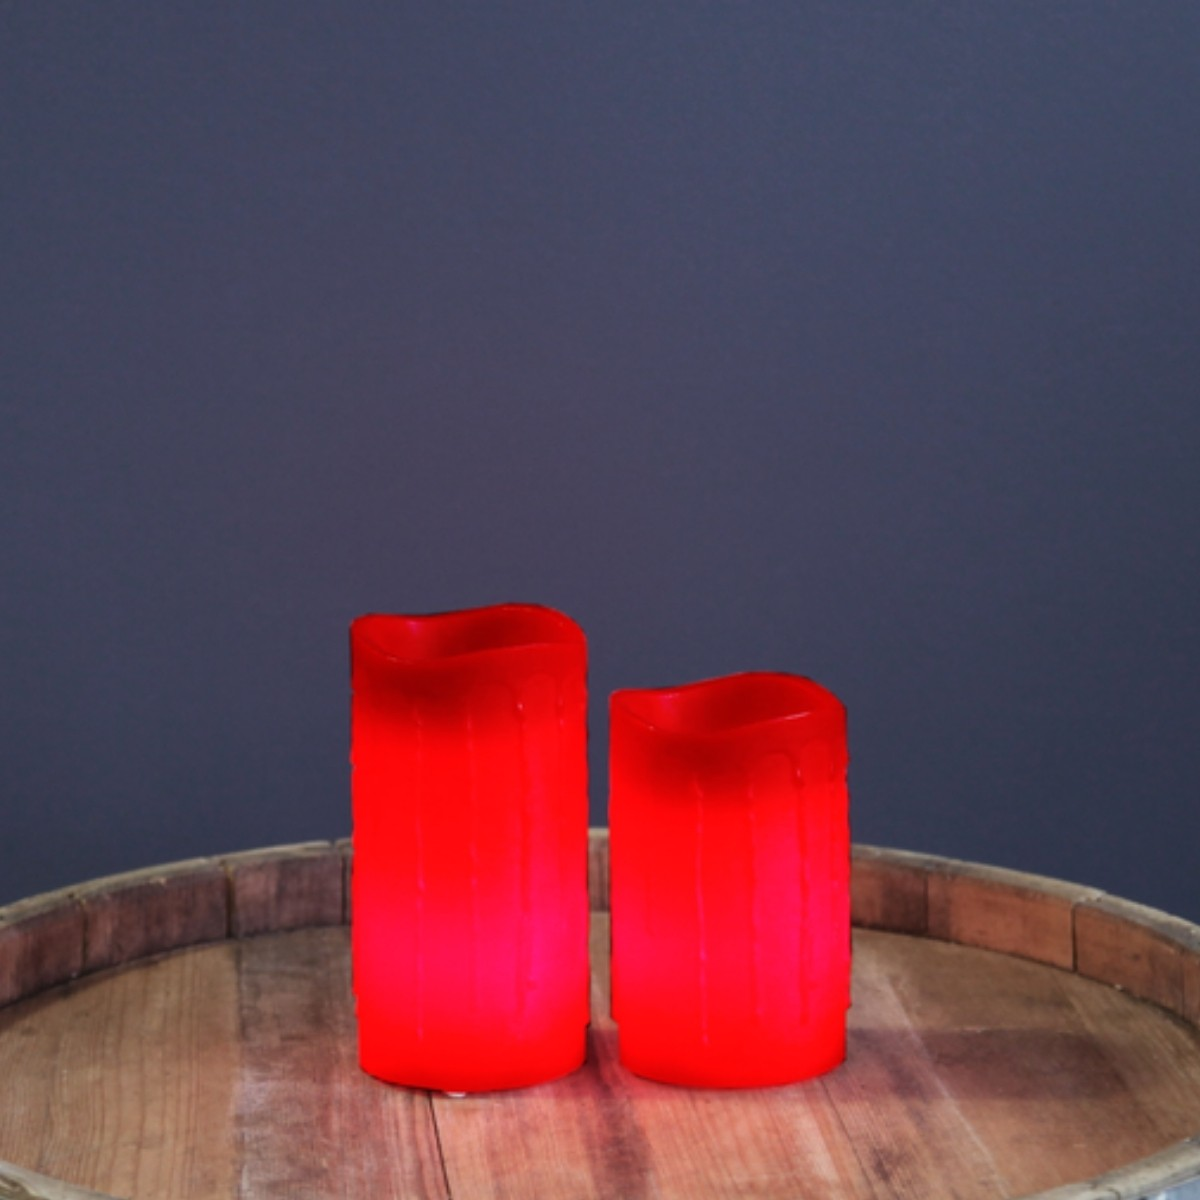 LED Kerze Drip - Echtwachs - flackernde LED - Timer - H: 12,5cm - rot